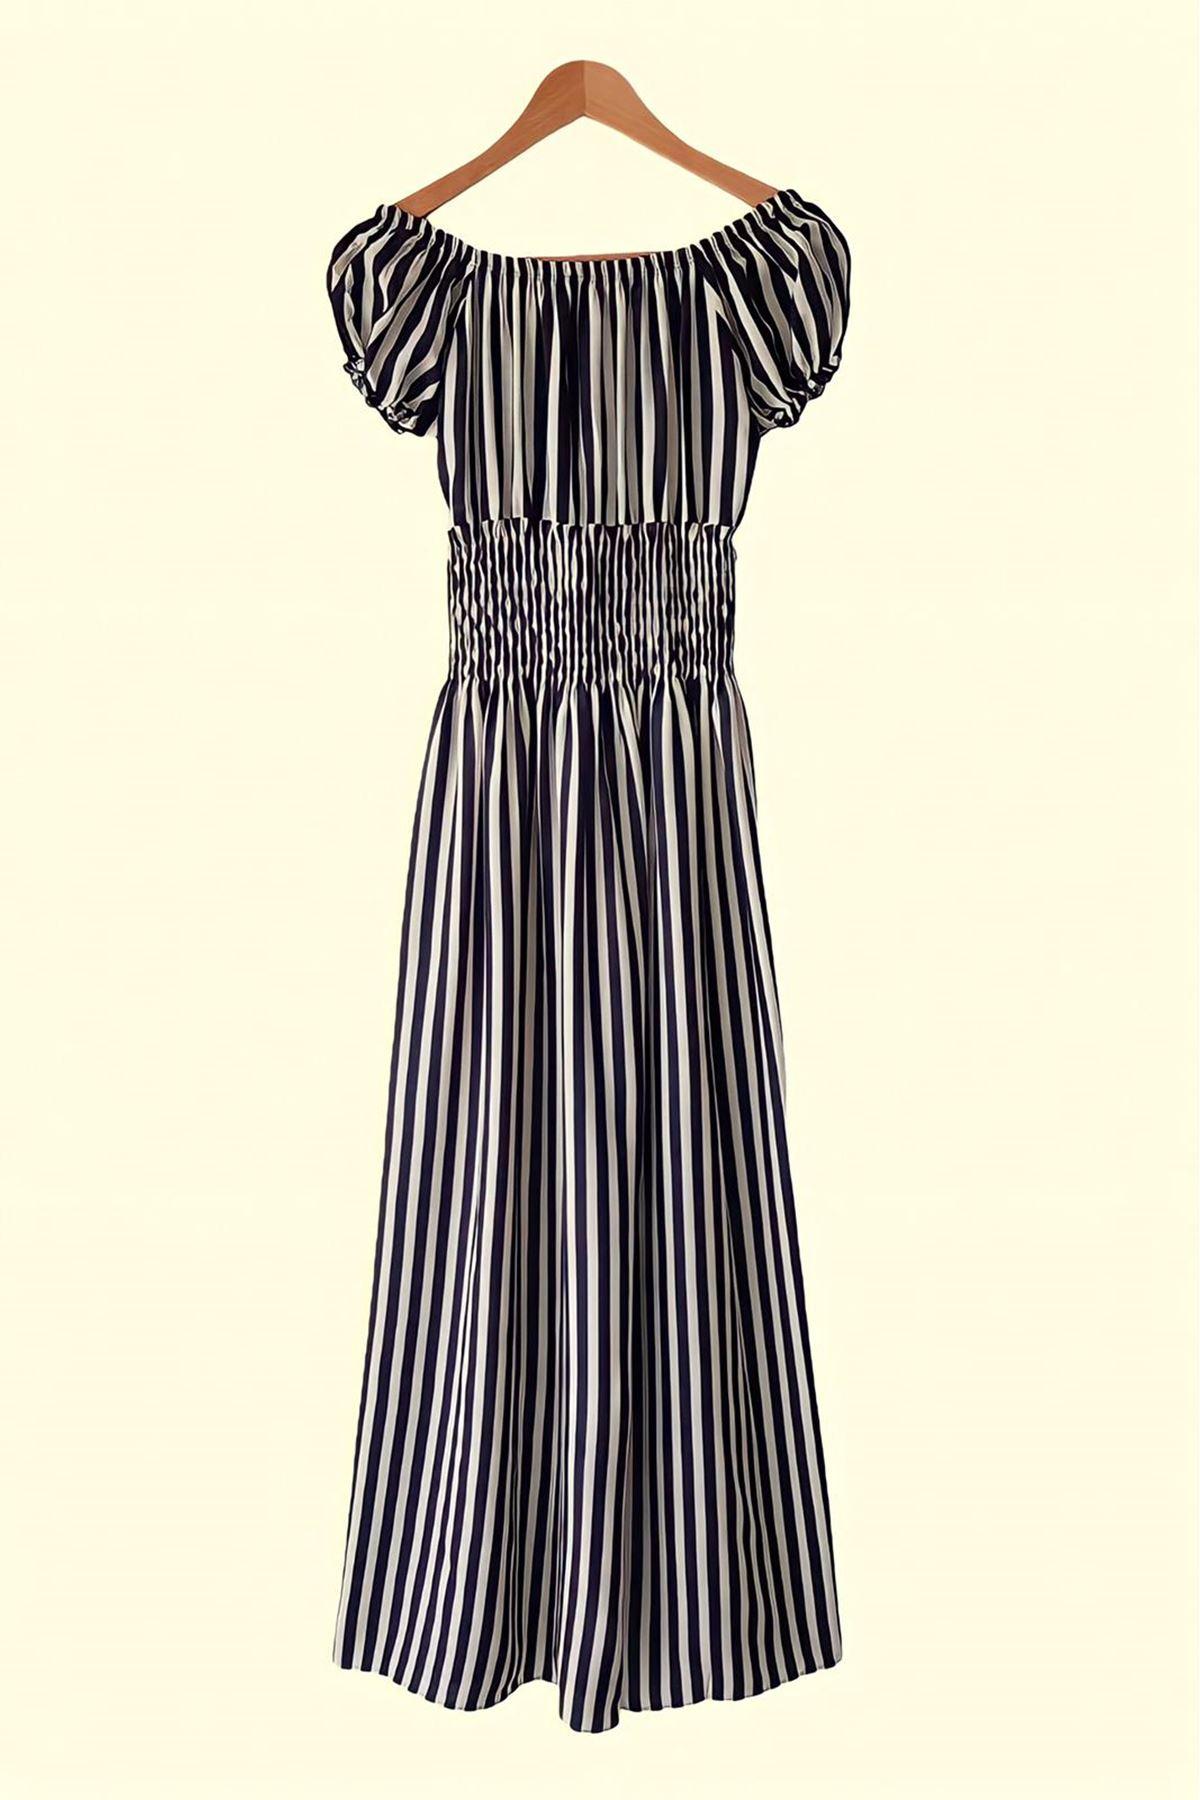 Madonna Yaka Çizgi Desen Elbise - SİYAH